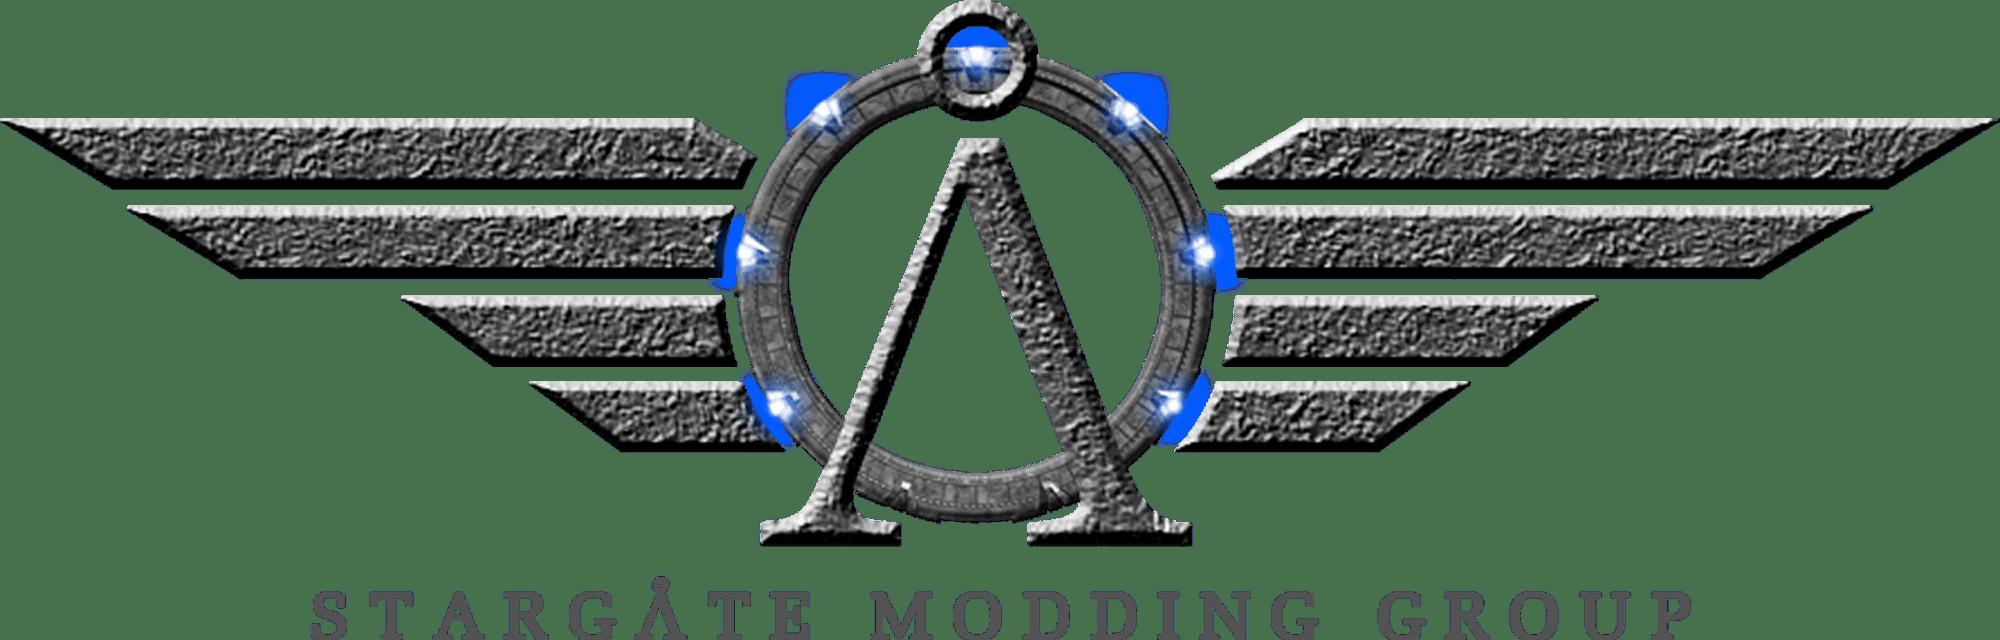 sgmg logo min